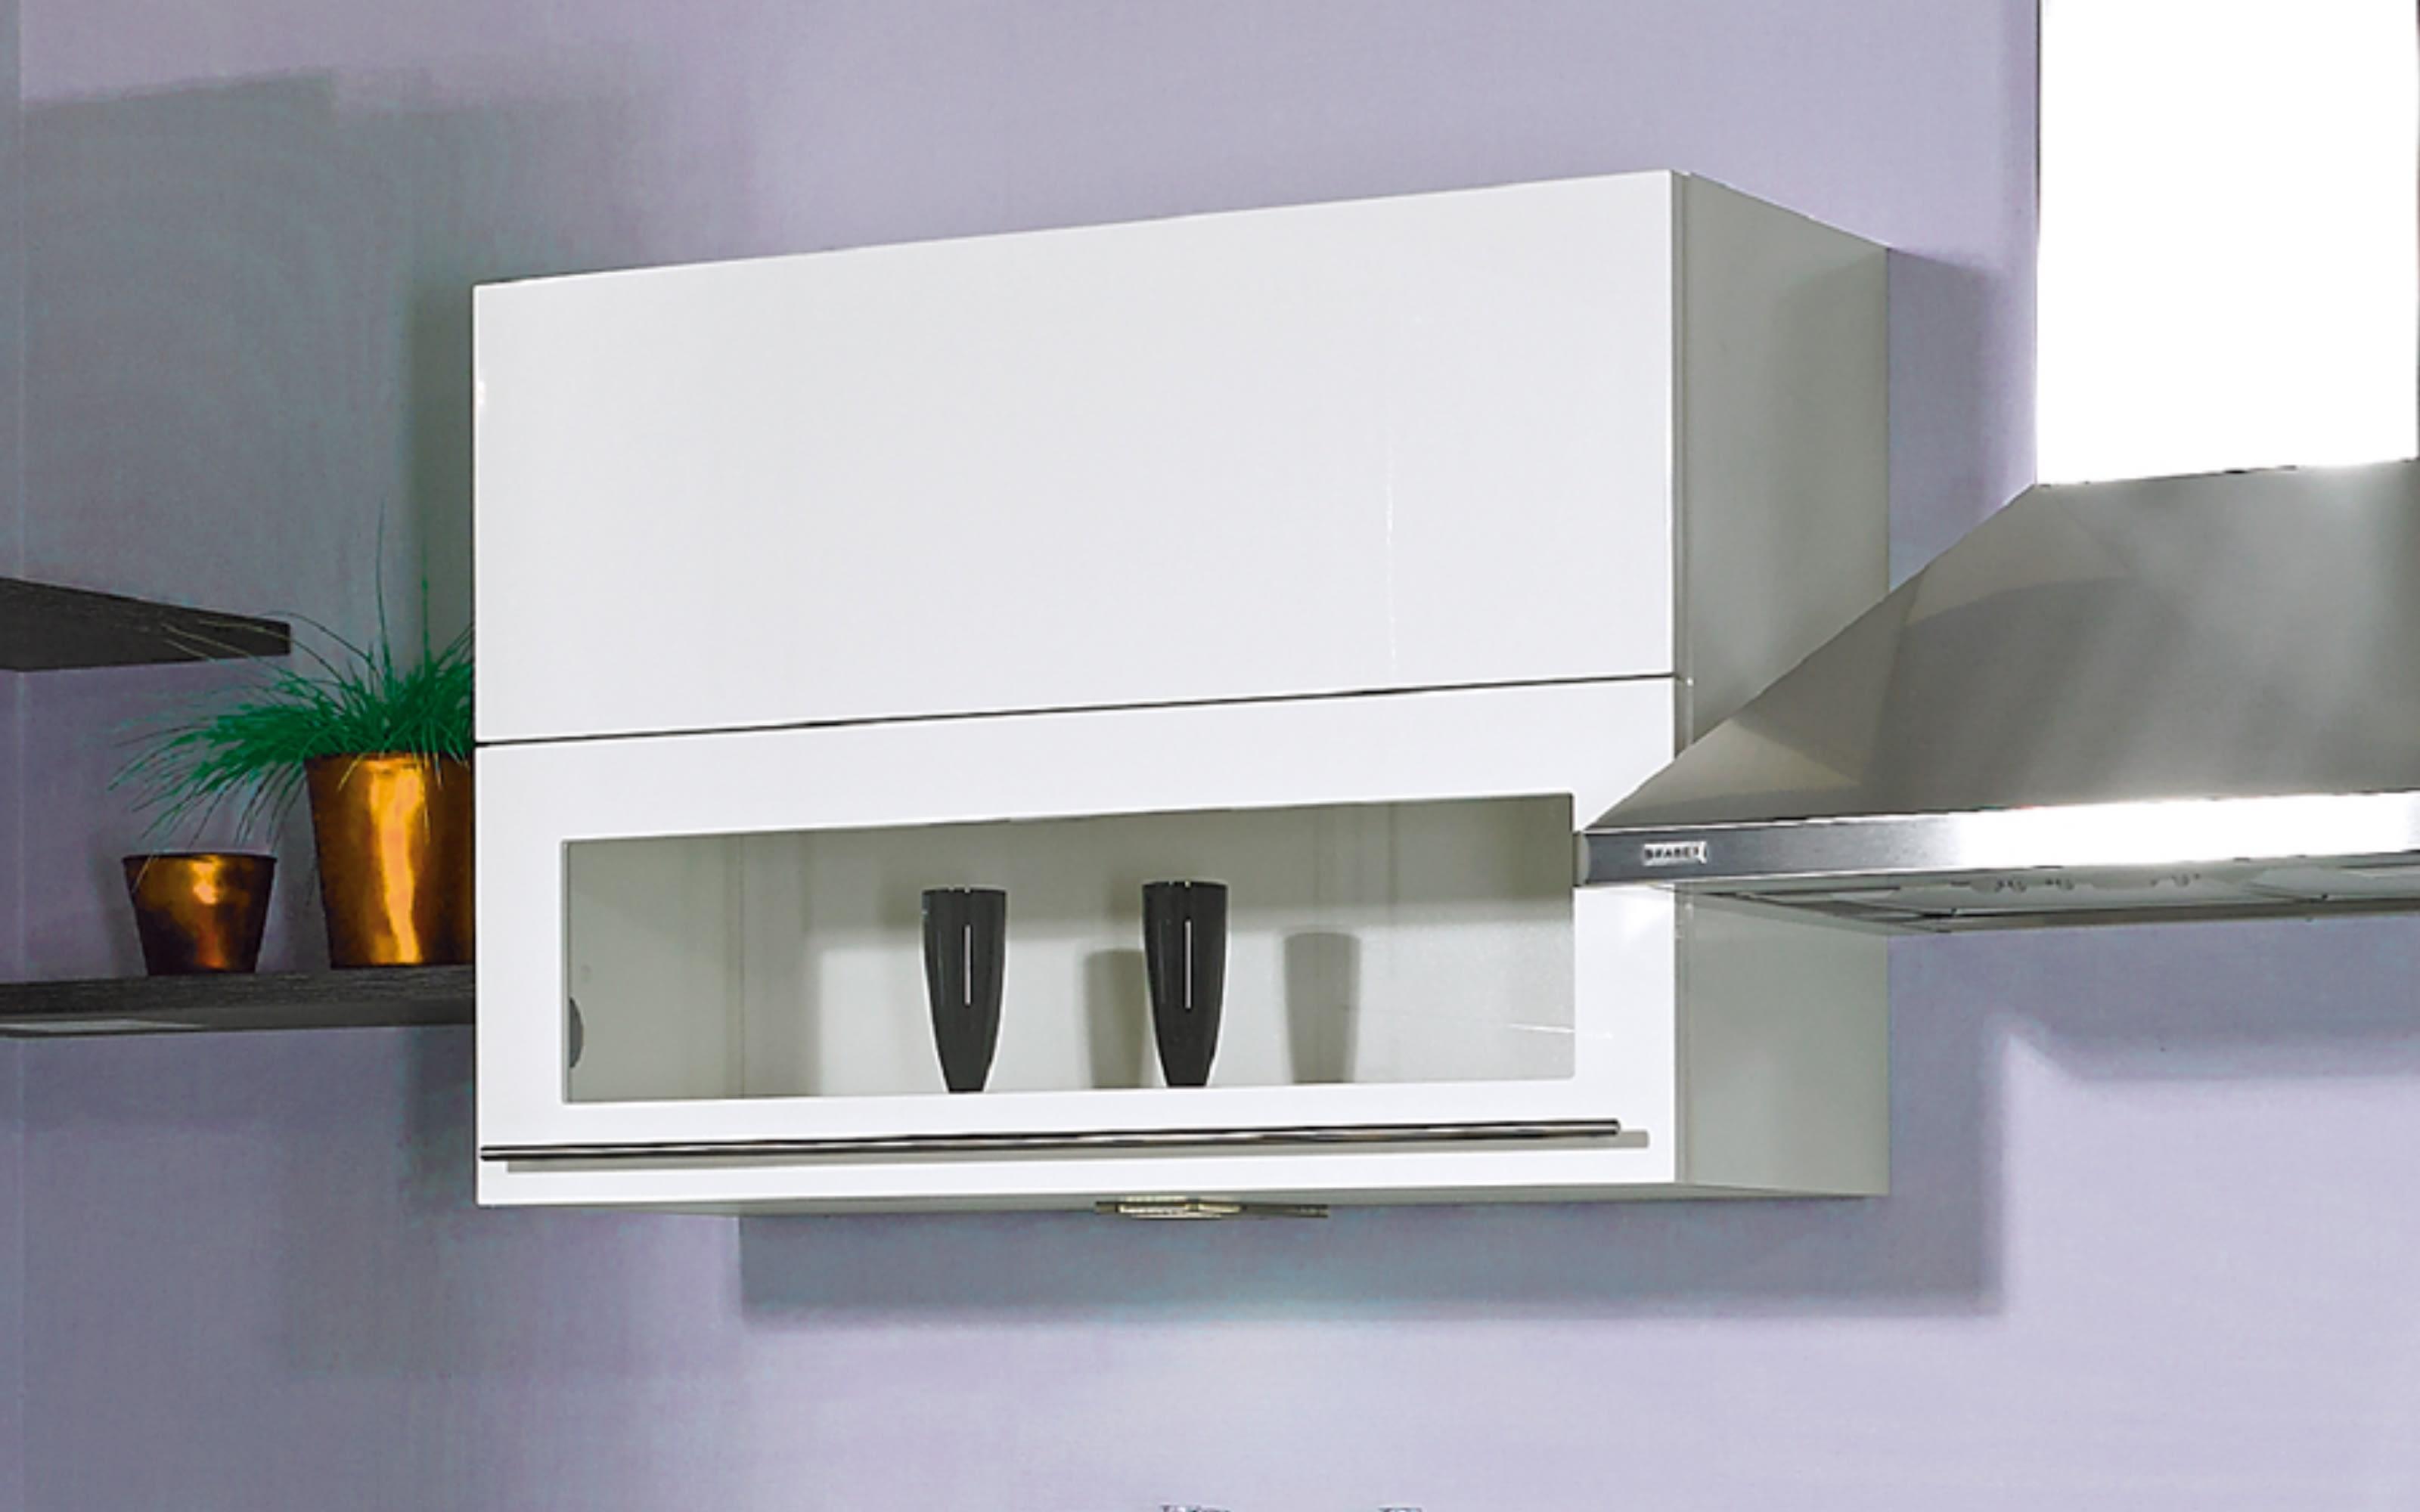 Einbauküche Flash, Hochglanz Lacklaminat magnolia, inklusive Elektrogeräte, inklusive AEG Geschirrspüler